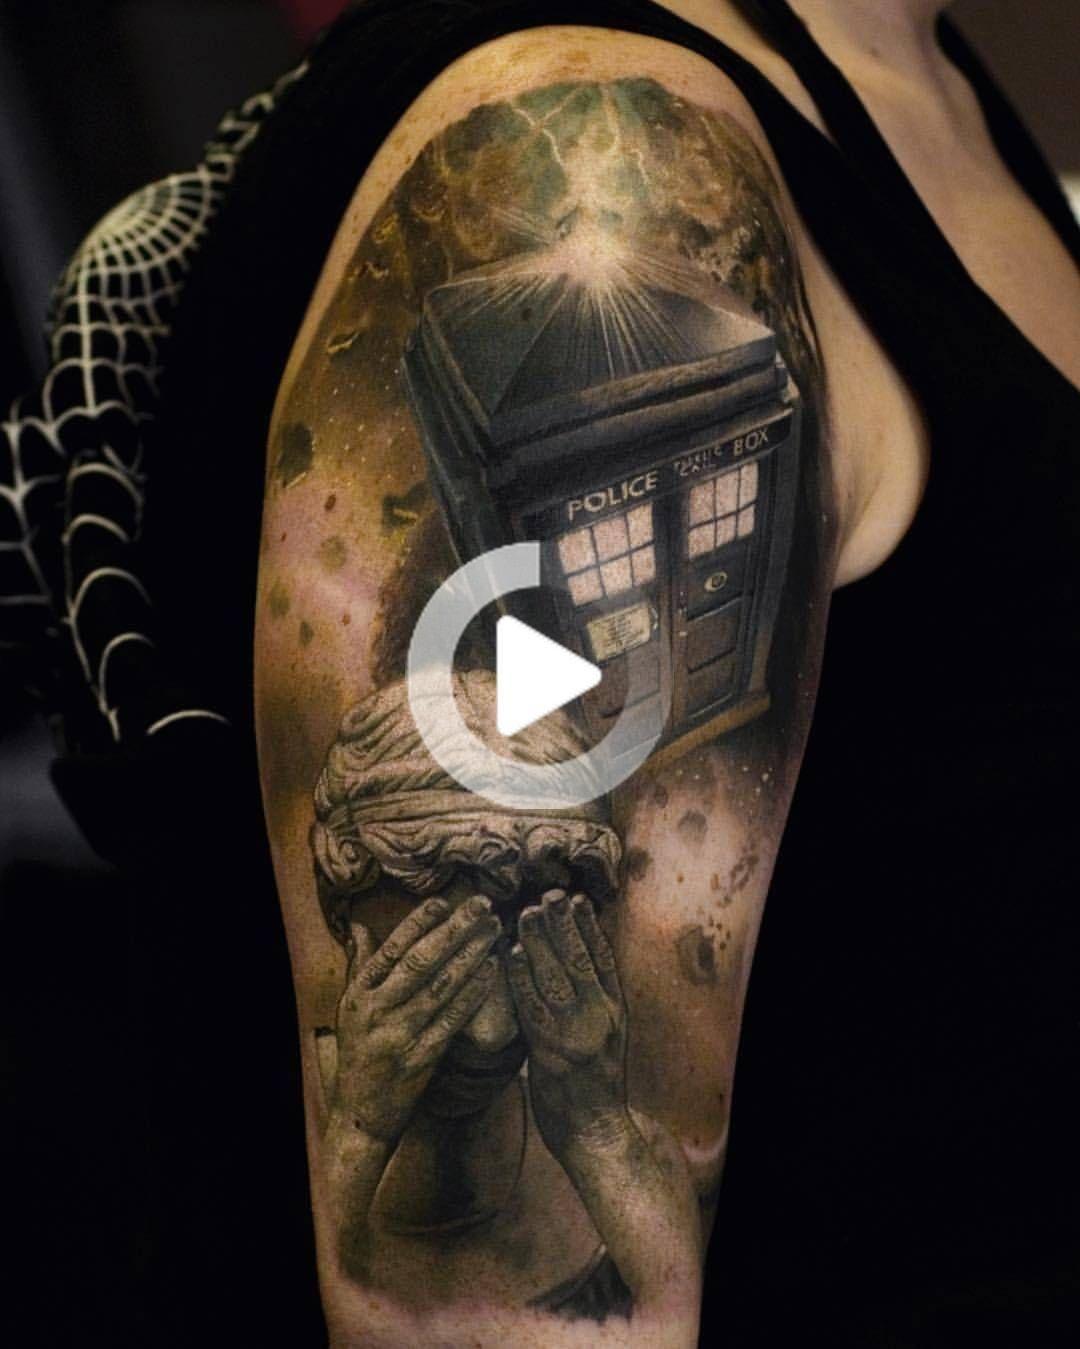 Doctor Who Manicotto Mezzo Del Tatuaggio Tardis Nello Spazio Weeping Angel Da Stefan Tattoos A Blackrainbowta Nel 2020 Tatuaggi Tatuaggi Carini Tatuaggi Doctor Who